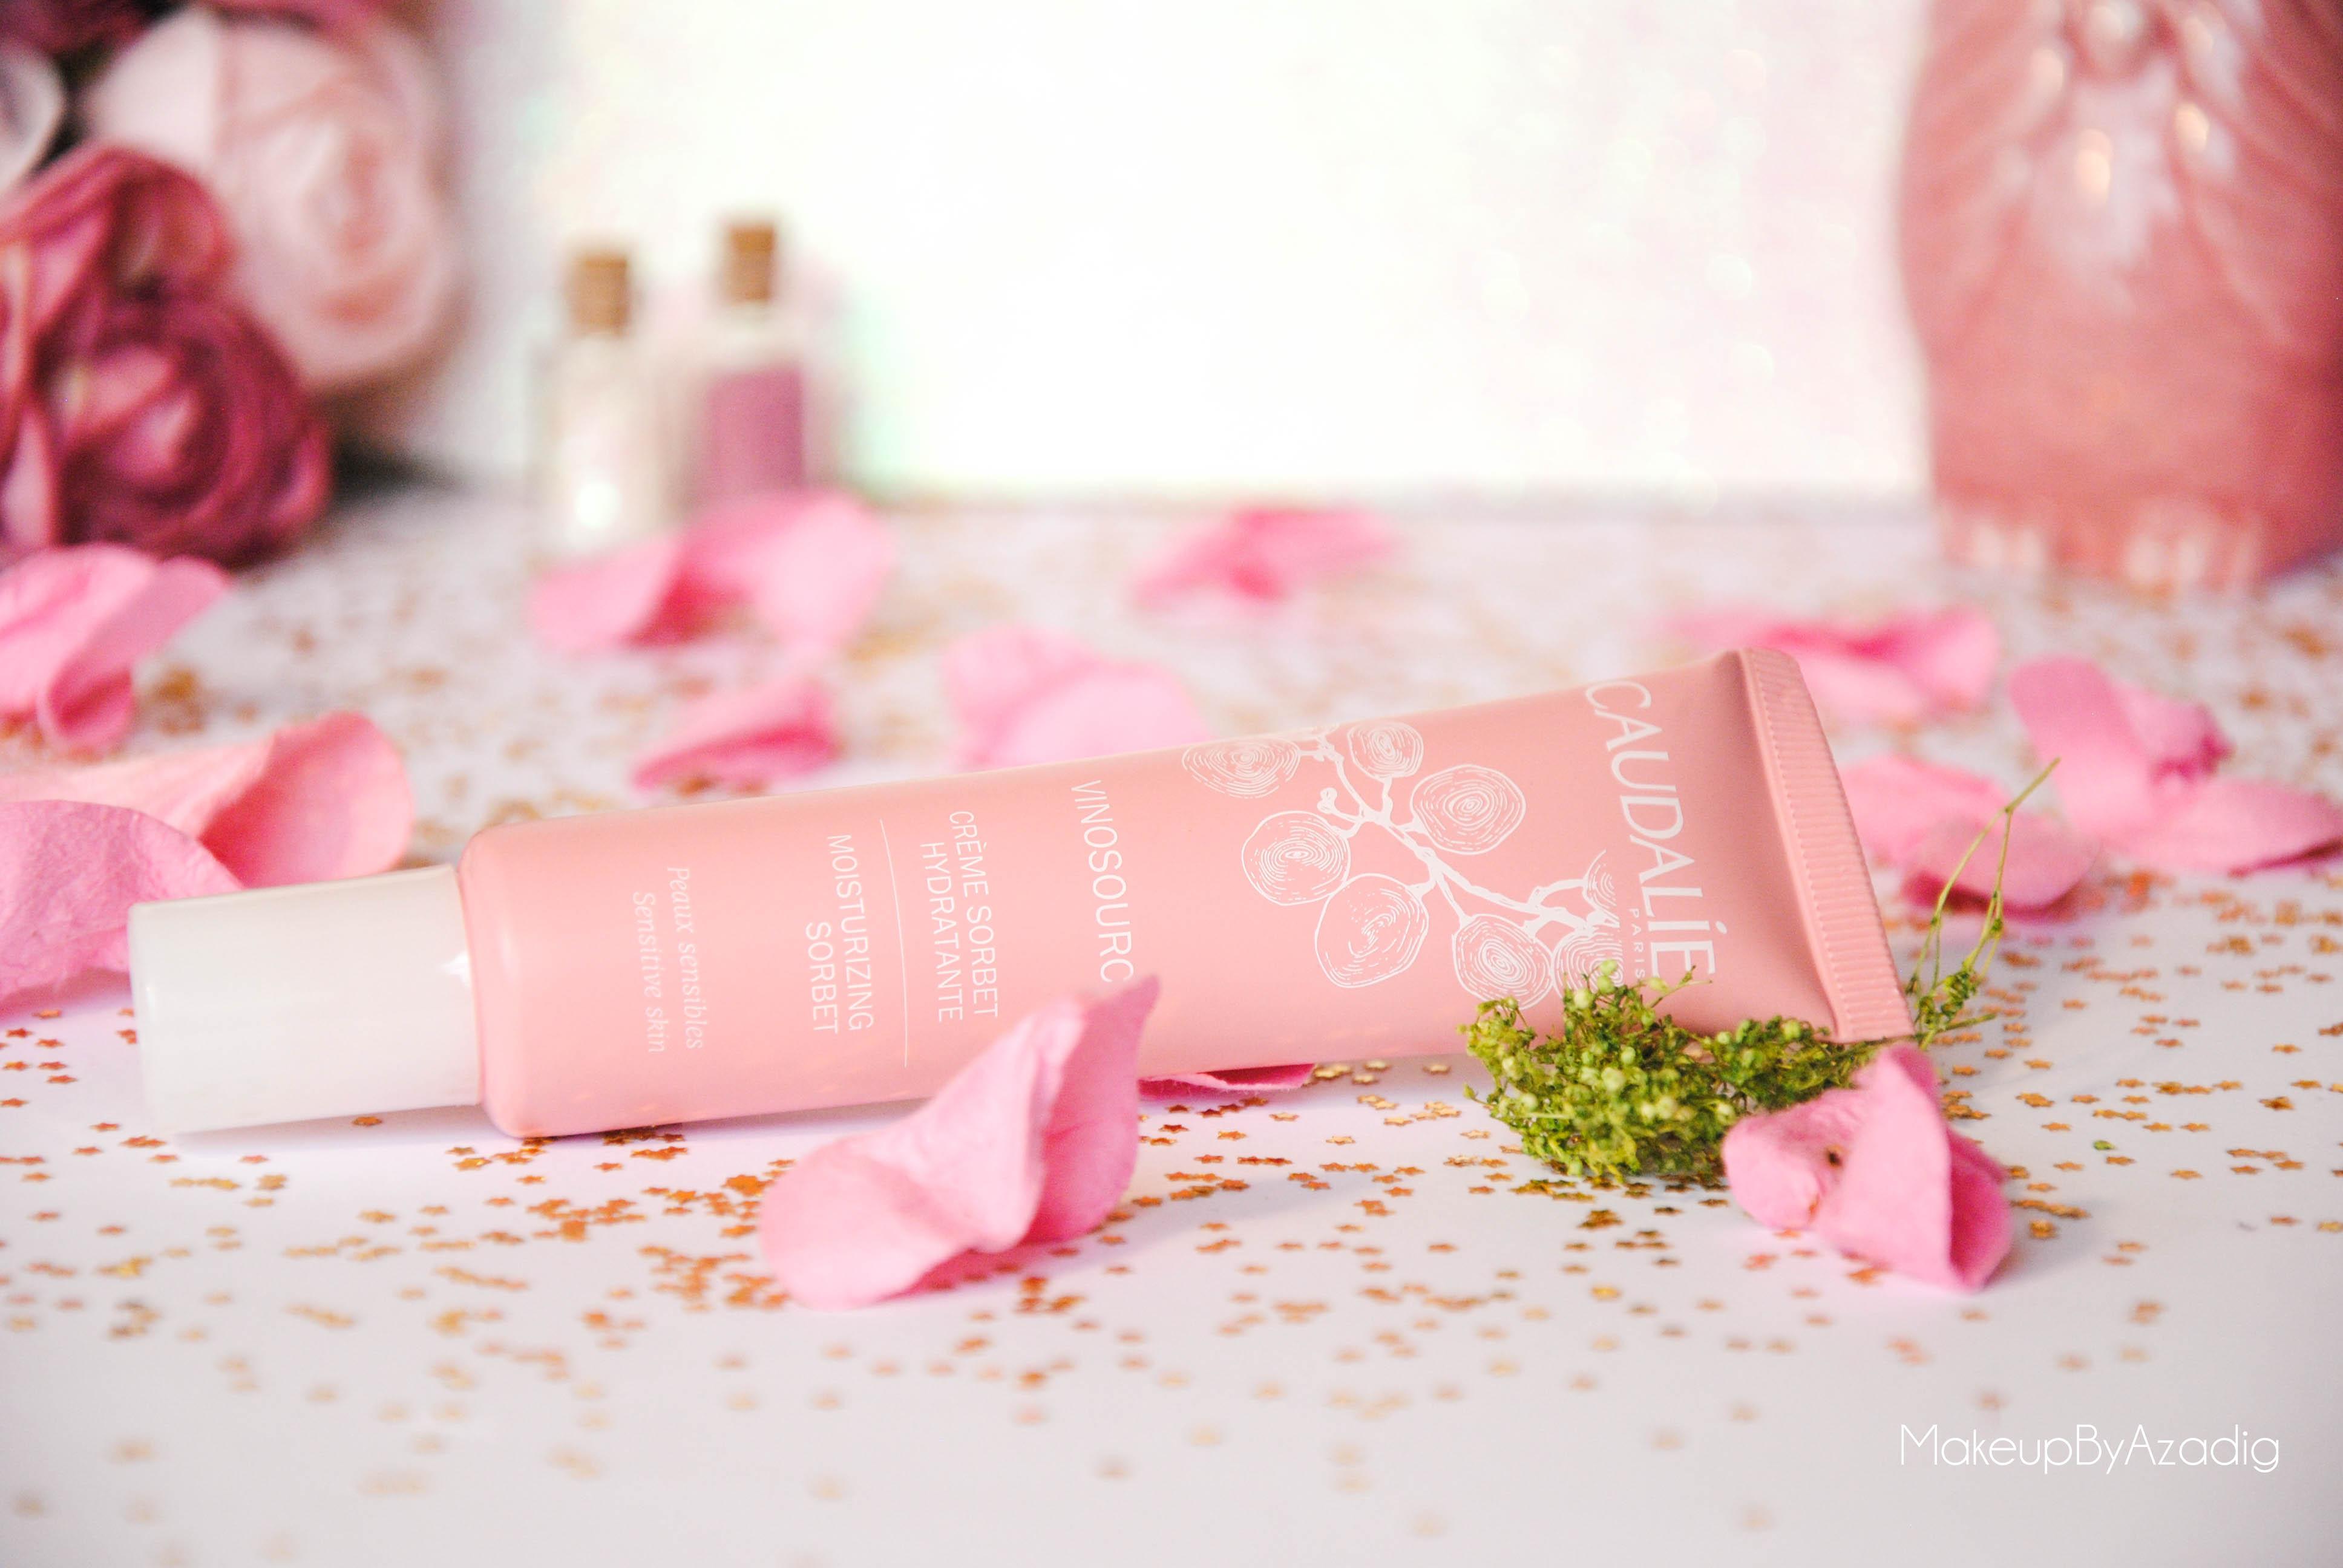 creme hydratante vinosource caudalie avis revue doctipharma makeupbyazadig raisin